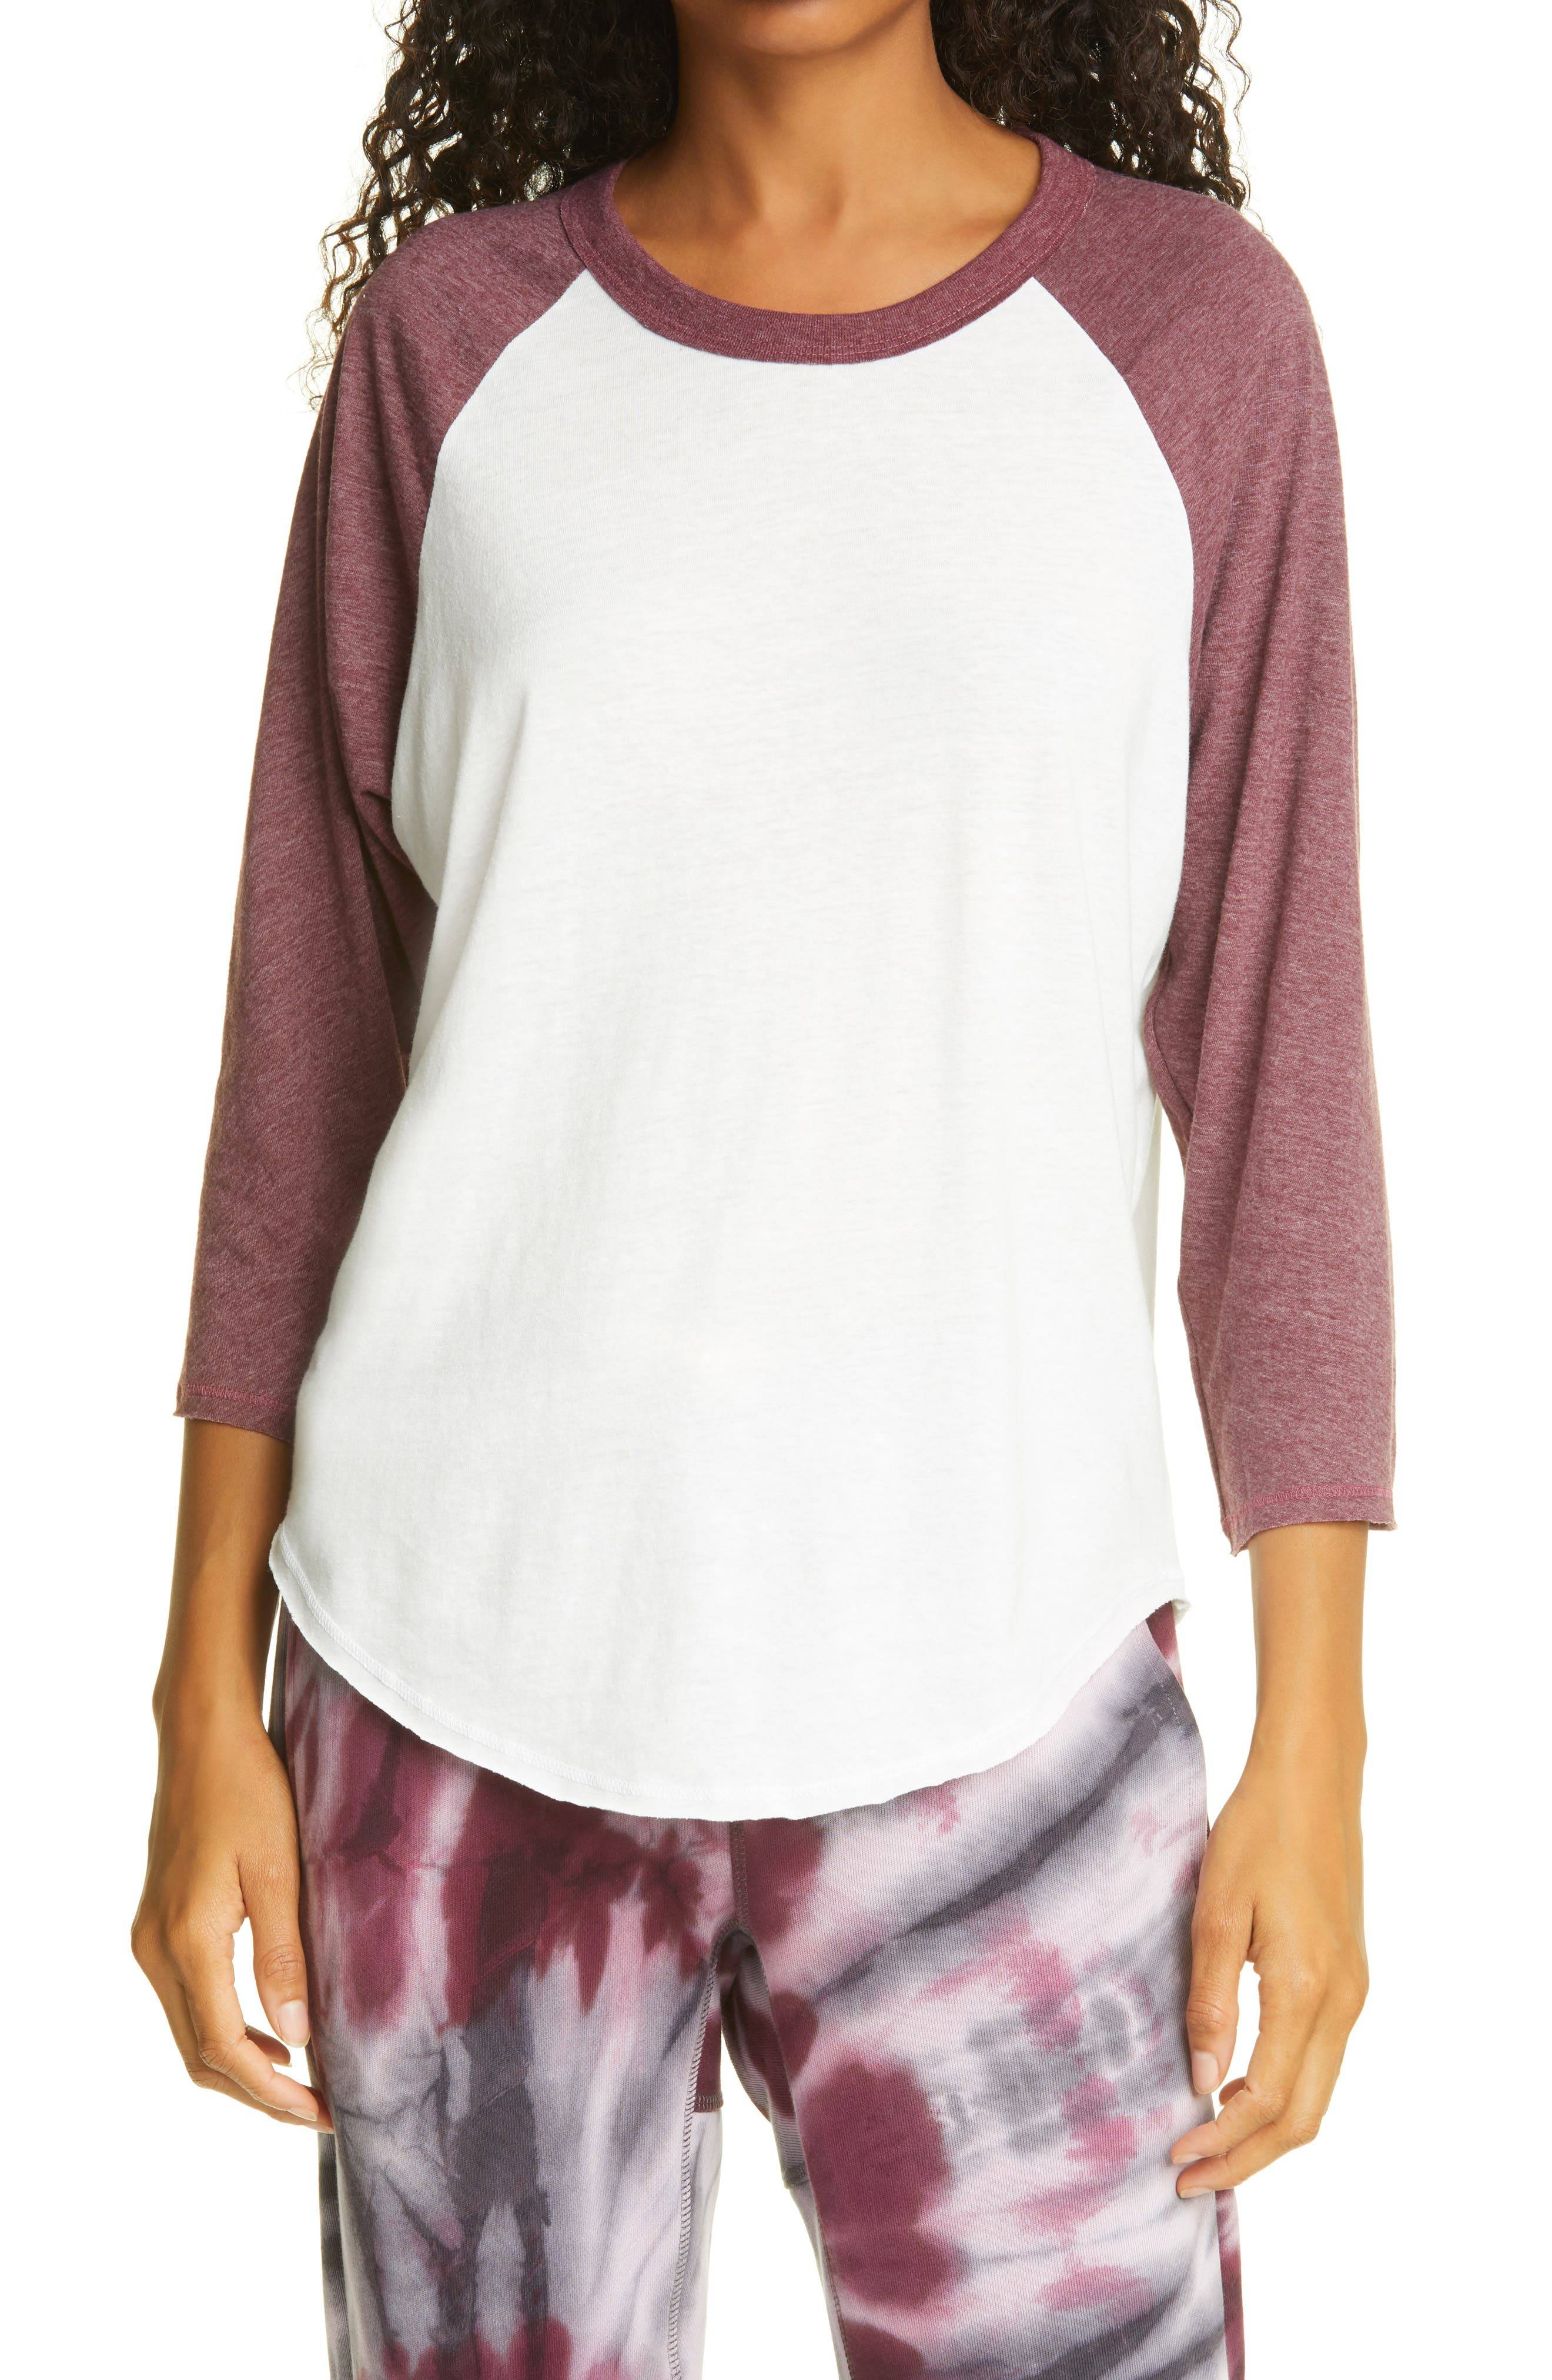 NSF Clothing Women's Nsf Clothing Brock Football T-Shirt, Size Small - White